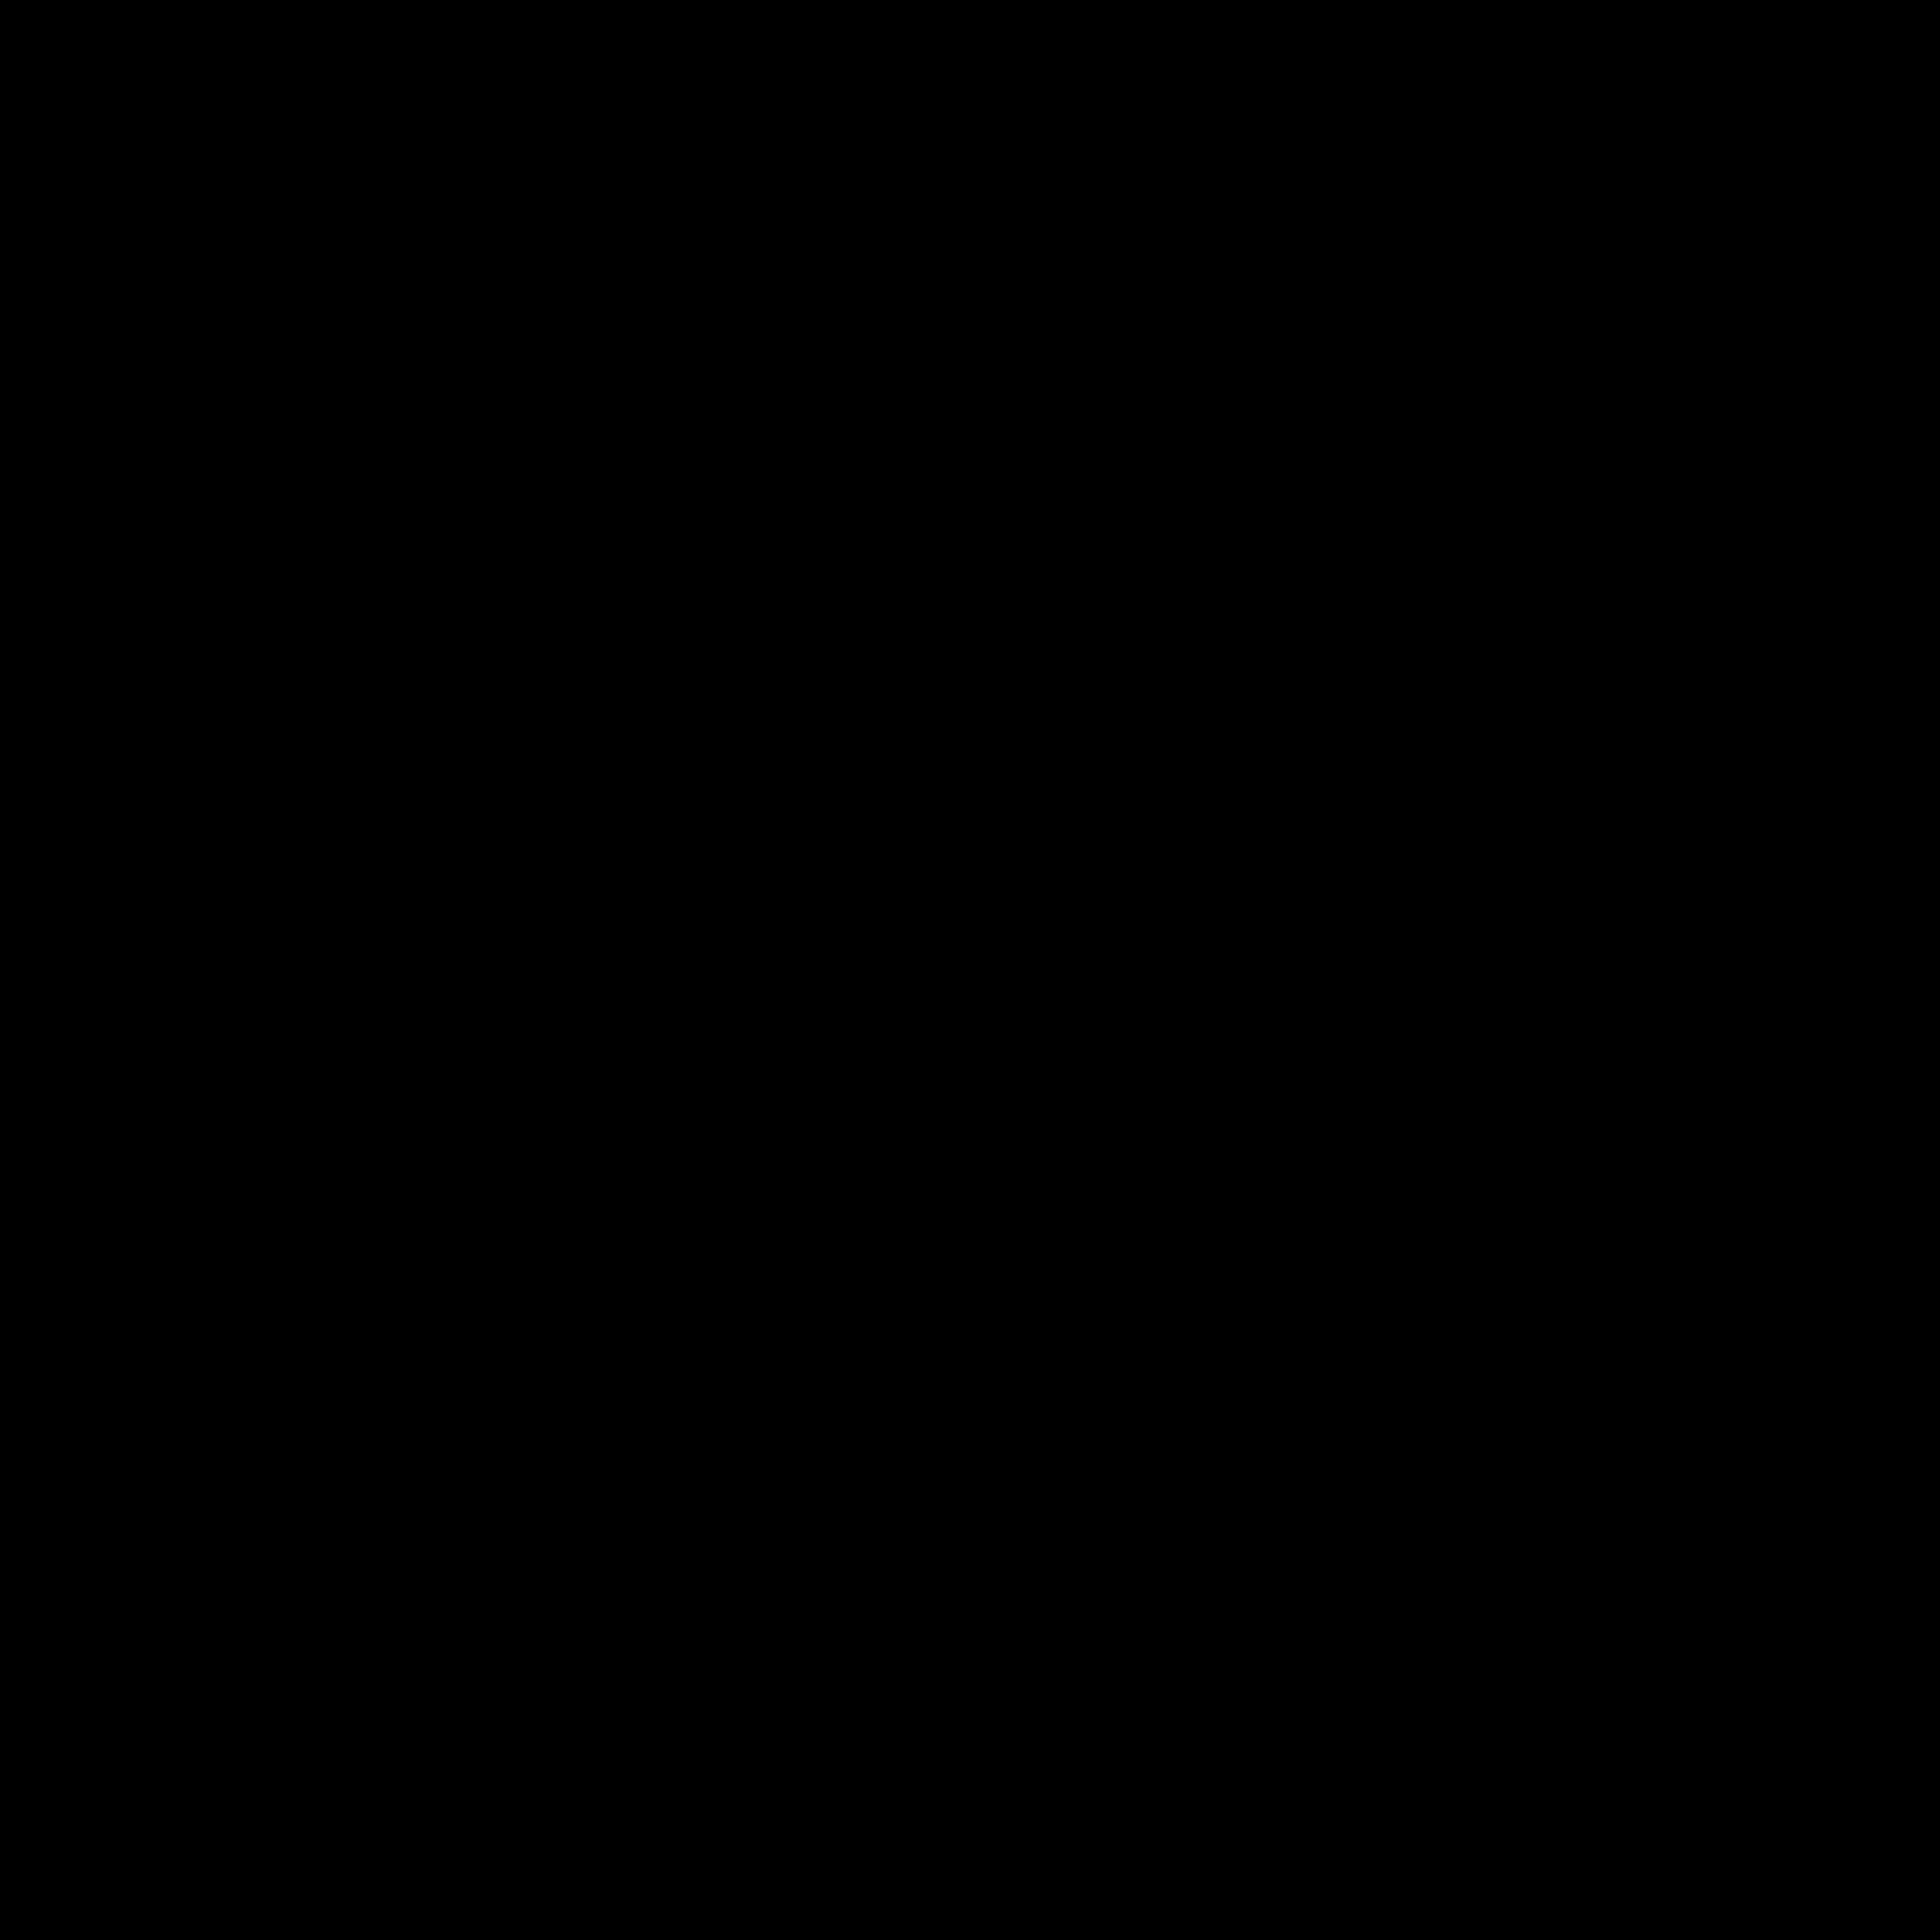 cartesian grid proper.png